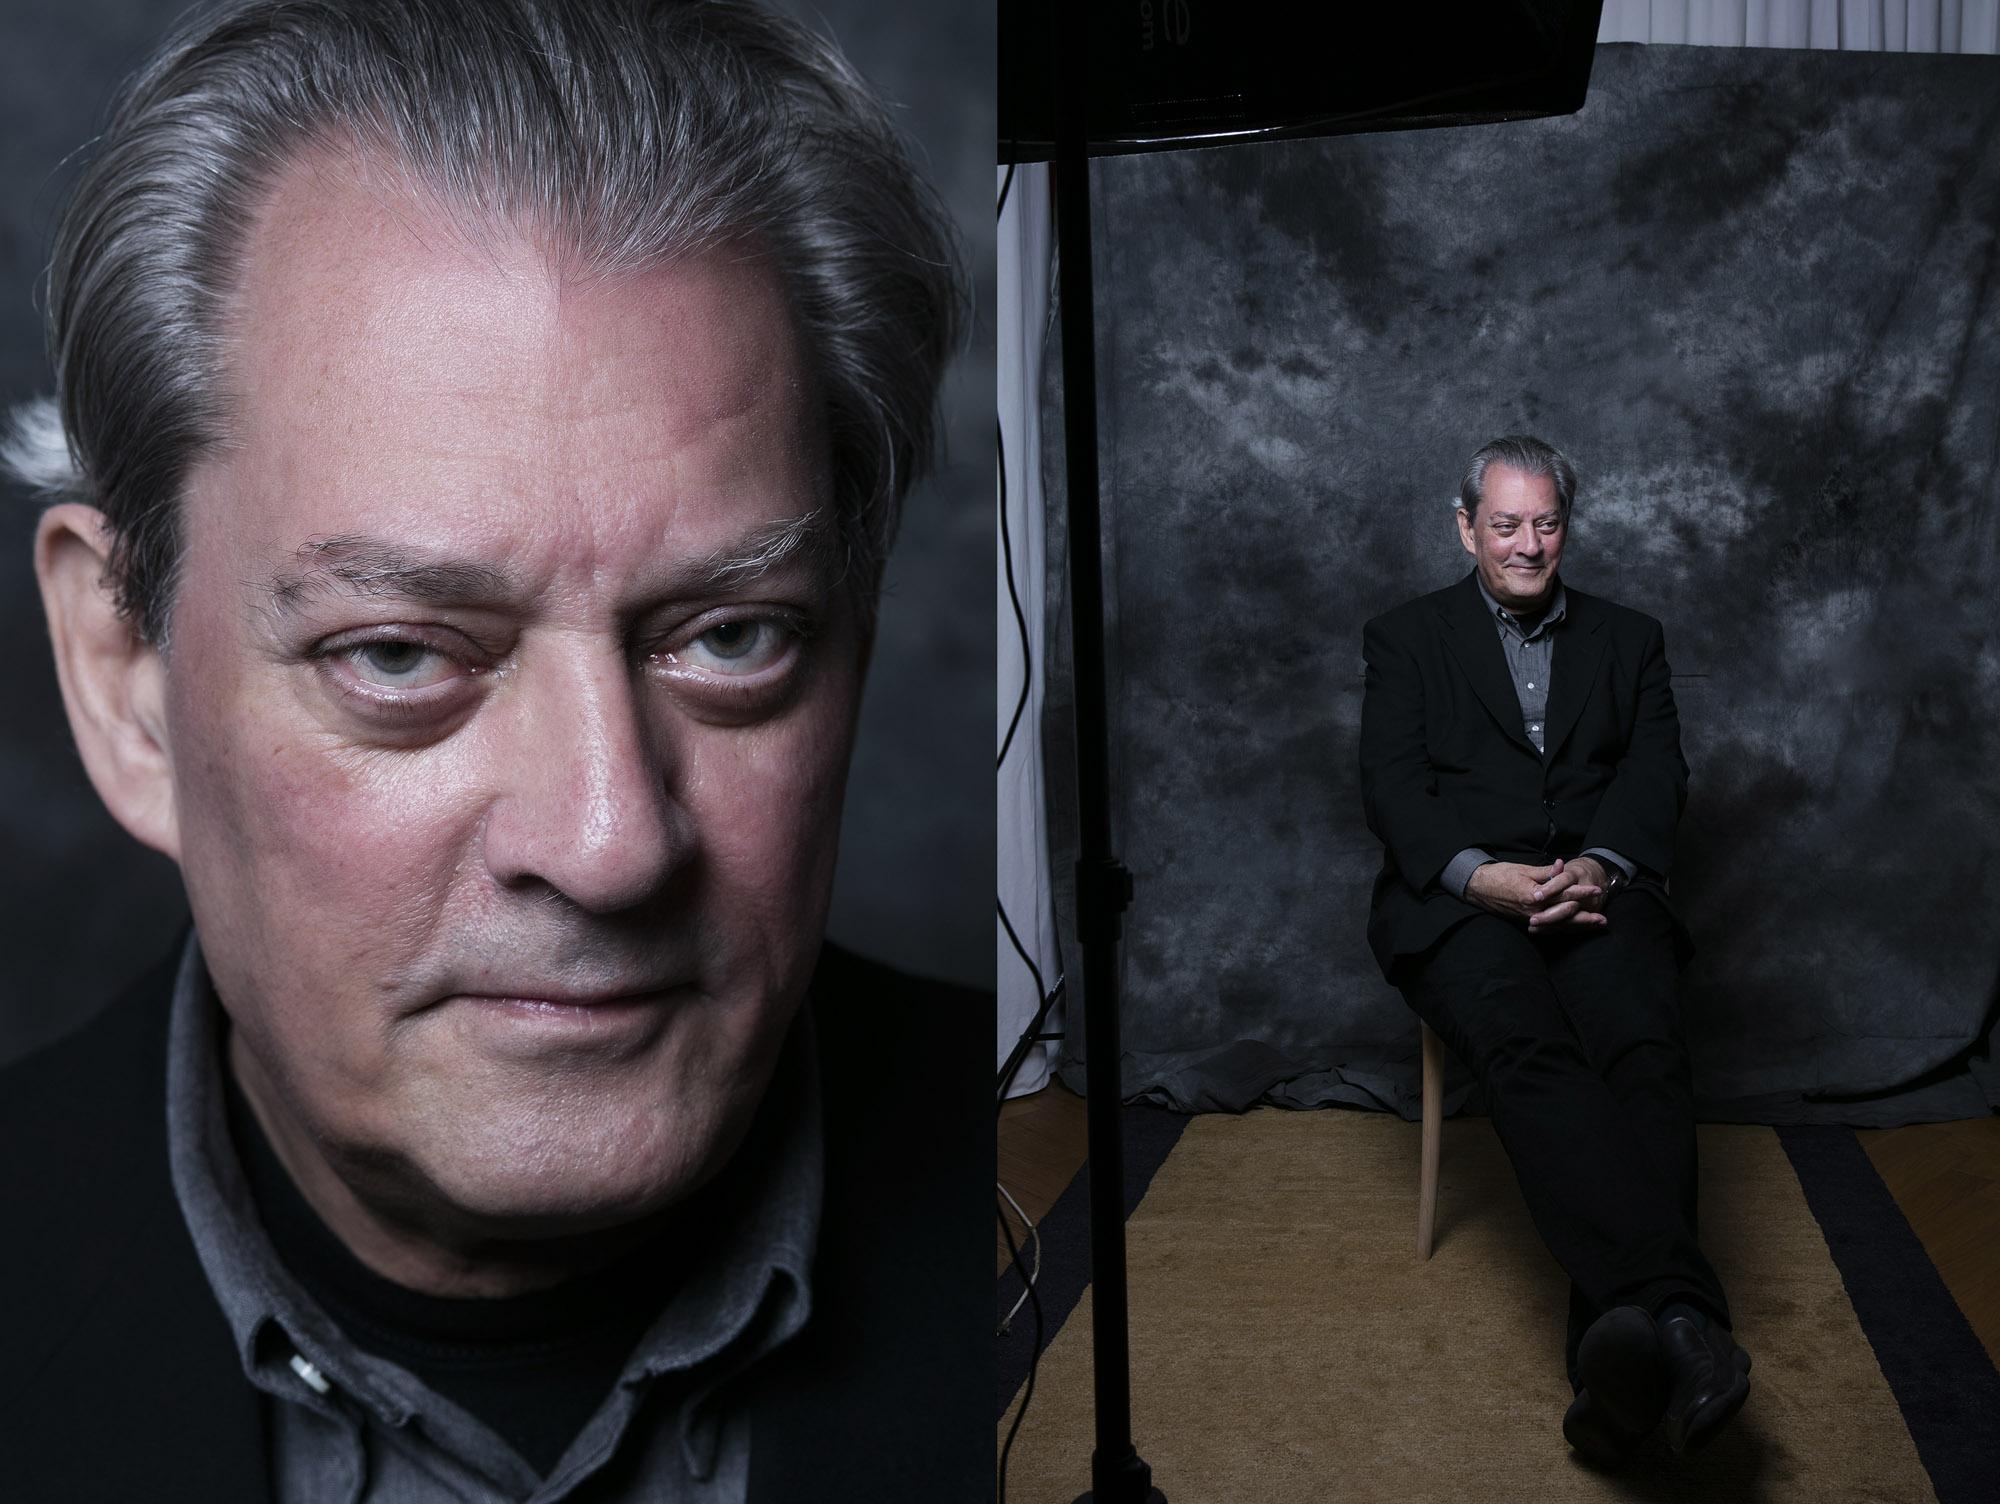 madrid portrait photographer spain 107.JPG